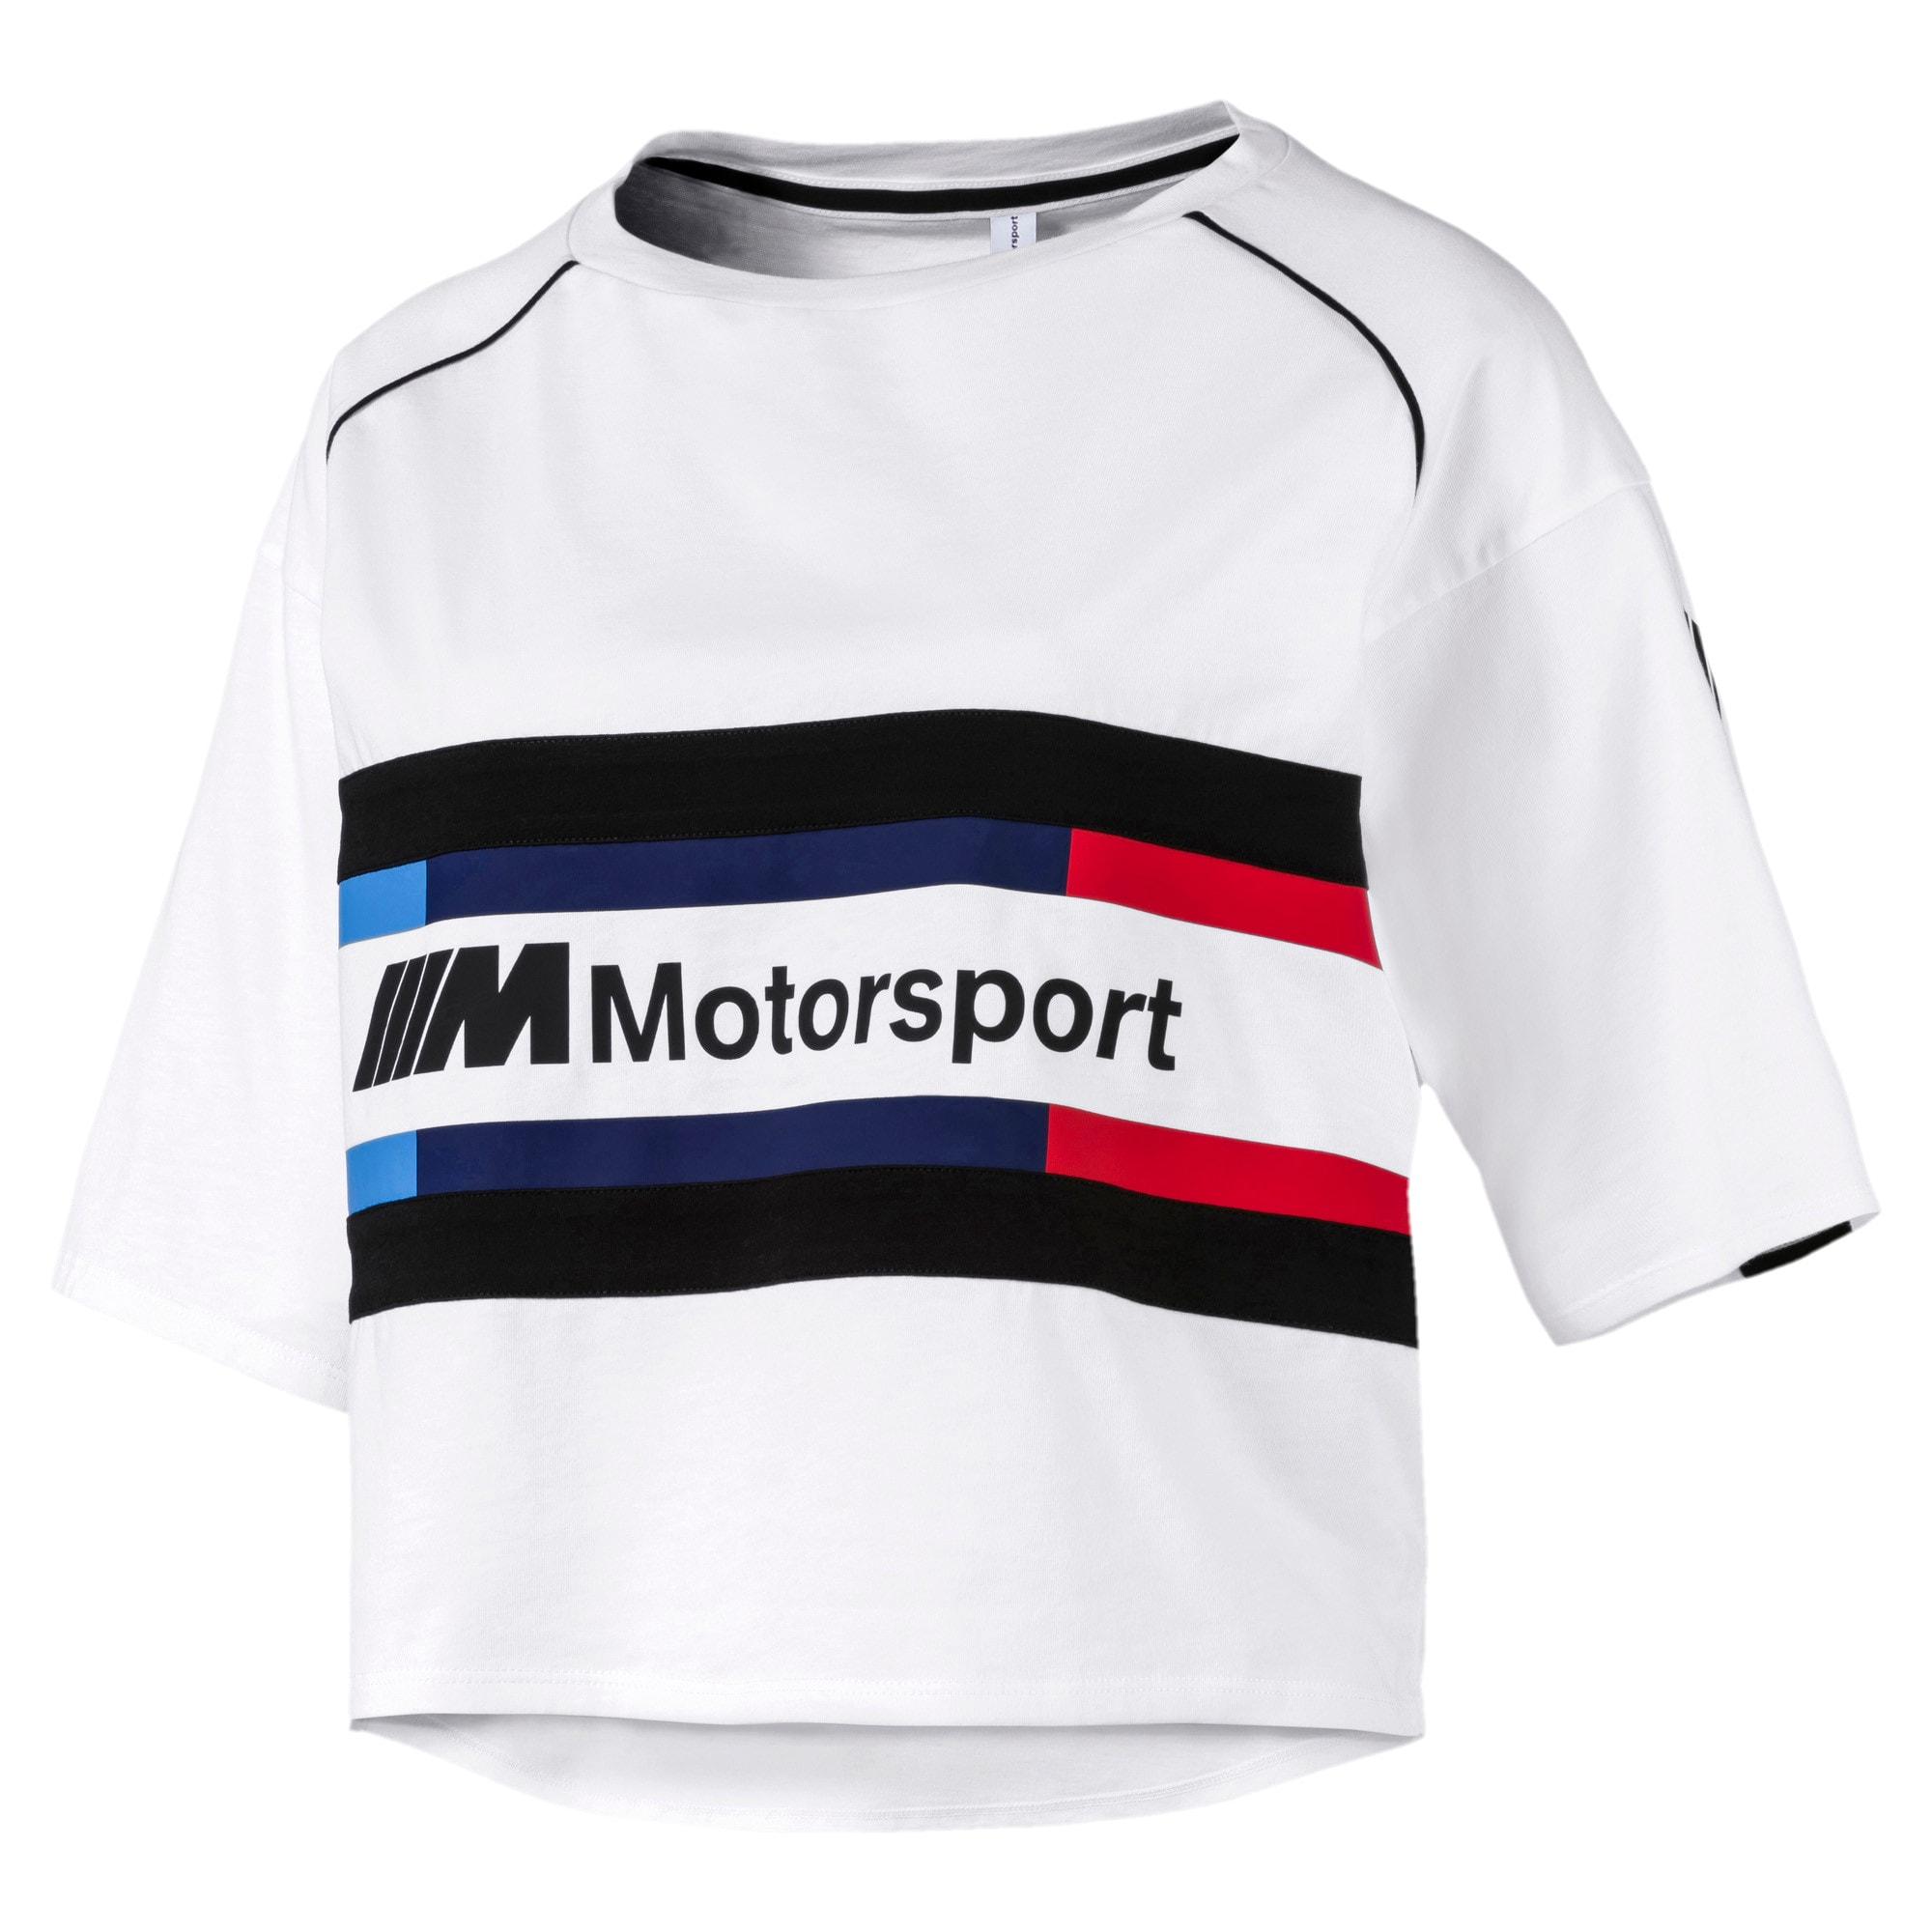 Thumbnail 4 of BMW M Motorsports Women's Street Tee, Puma White, medium